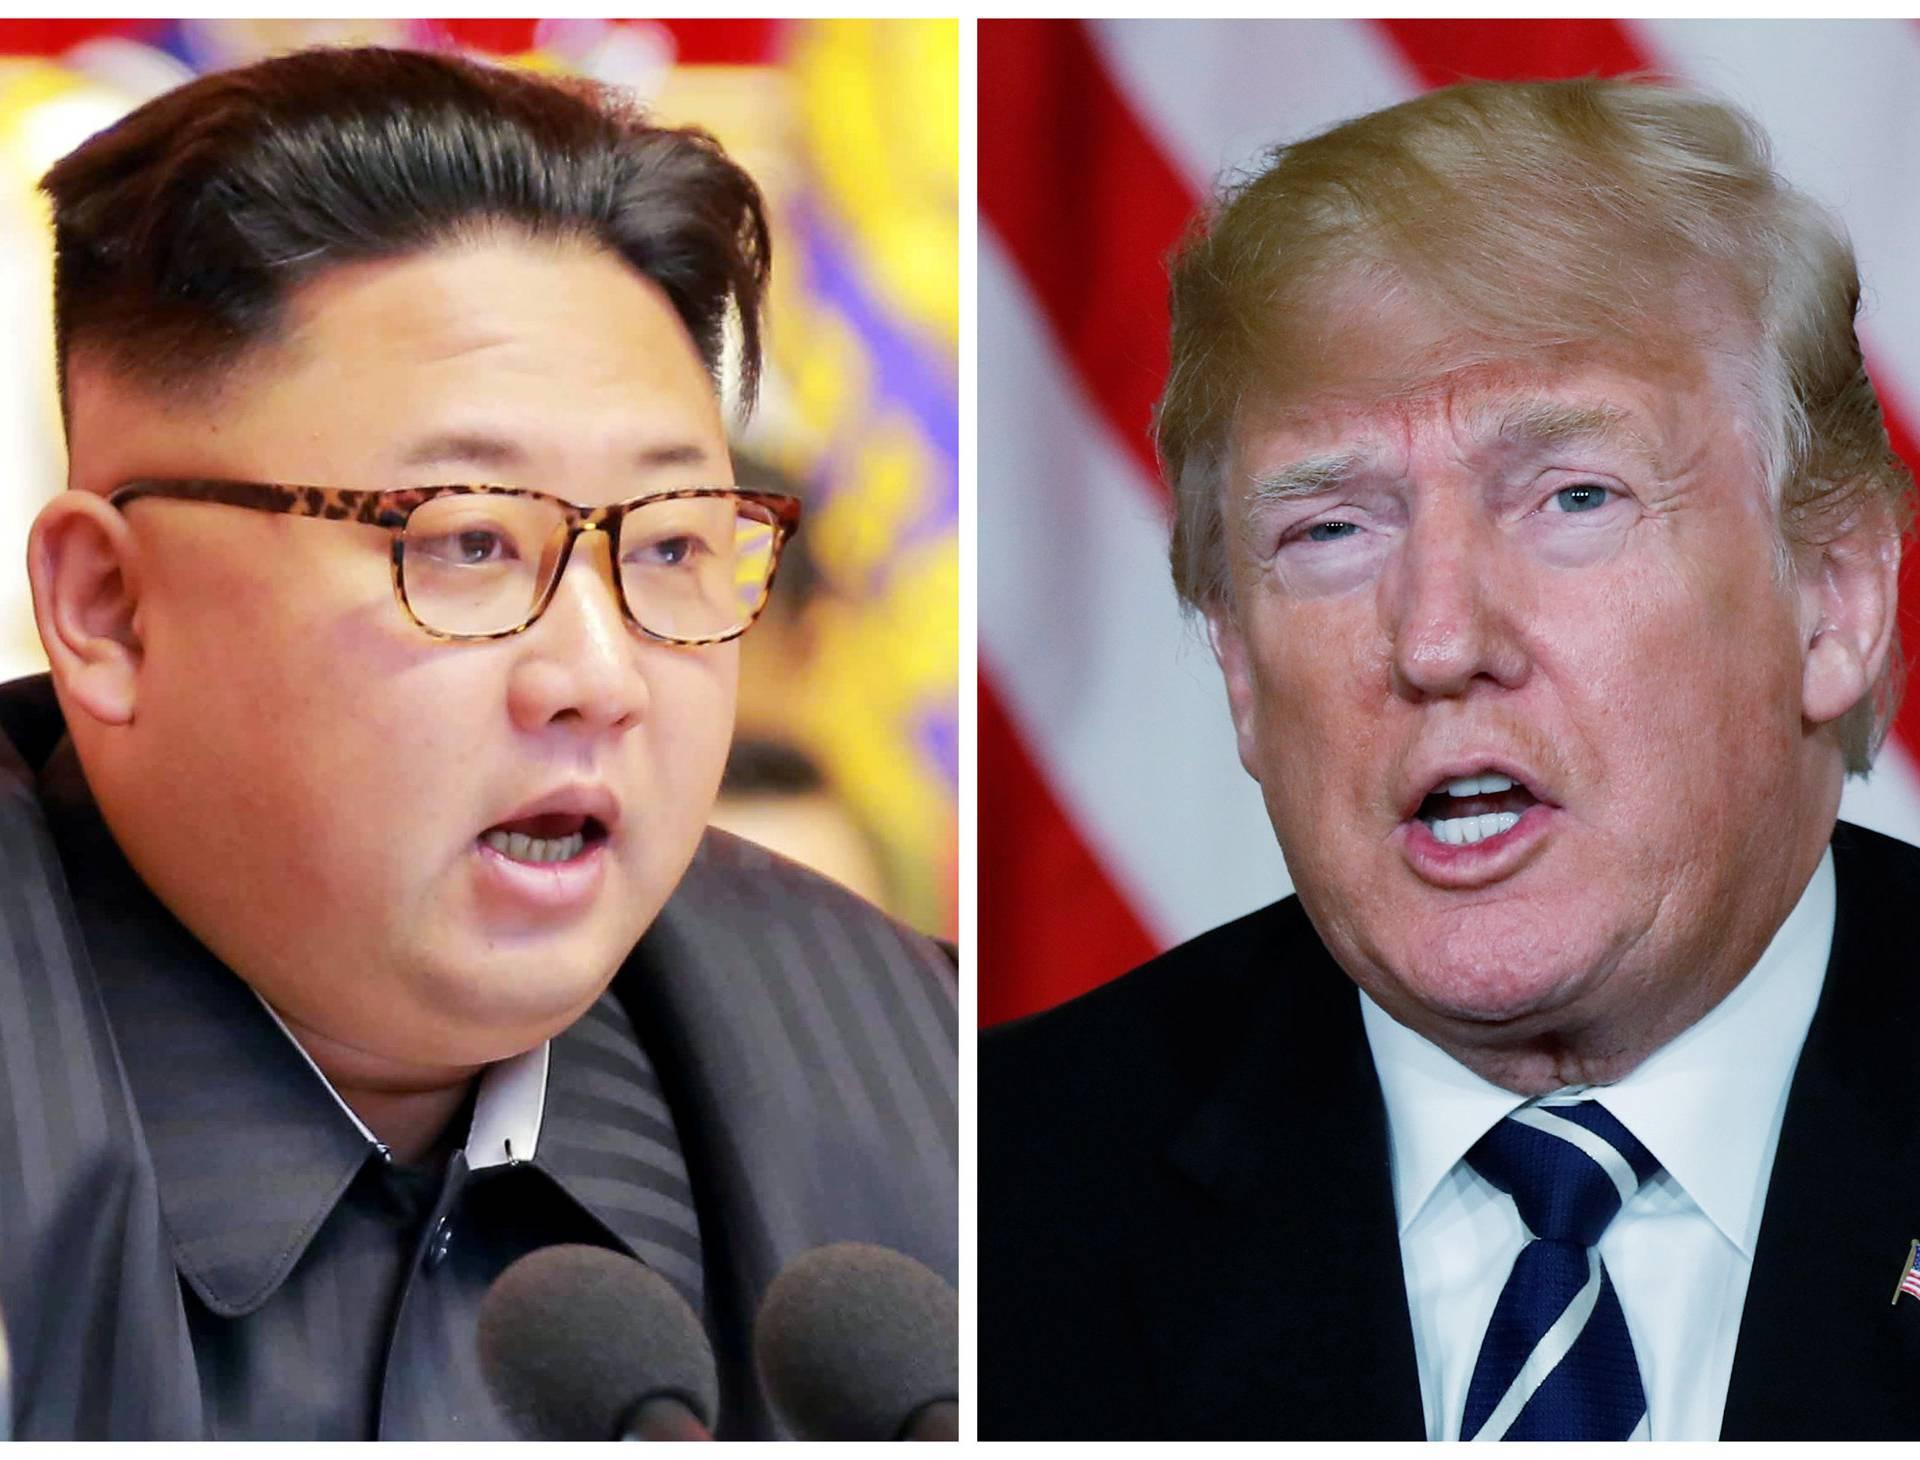 FILE PHOTO: A combination photo of North Korean leader Kim Jong Un and U.S. President Donald Trump